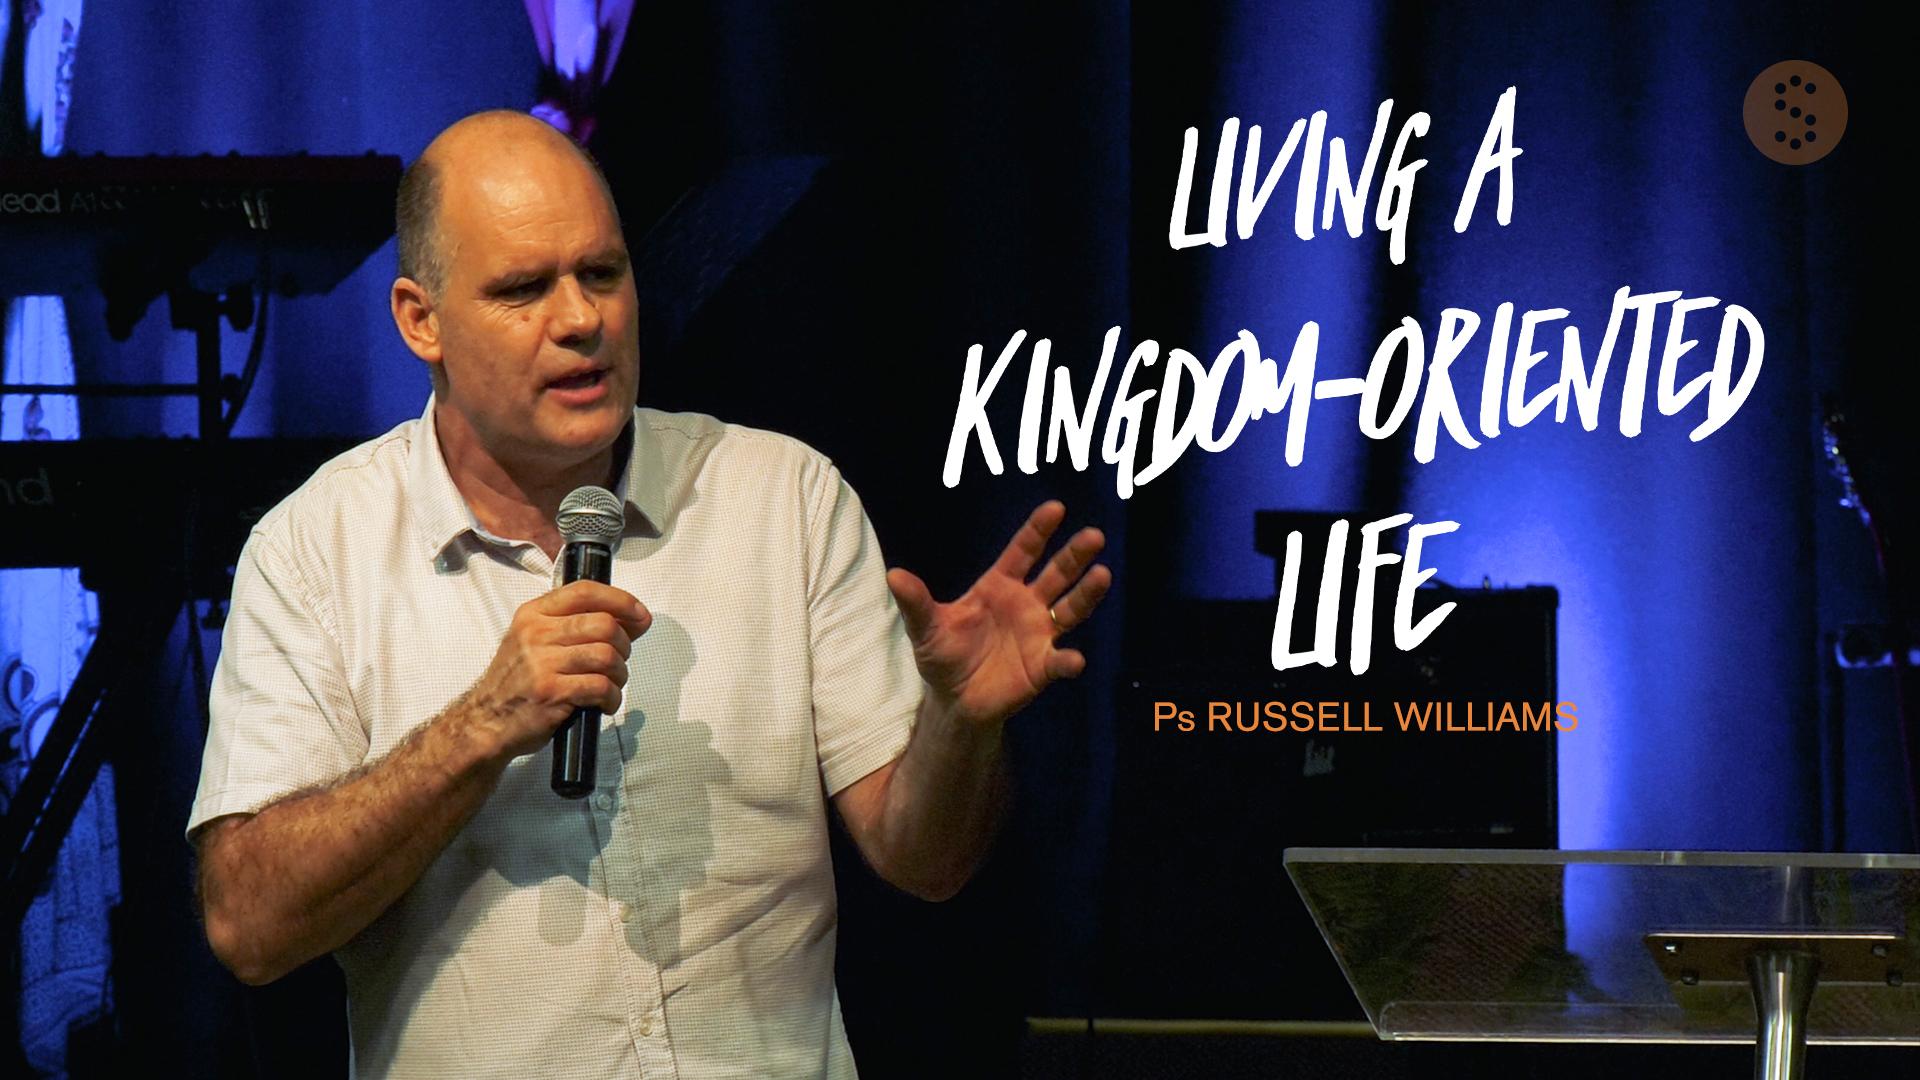 180708-kingdom-oriented-life-THUMB.jpg